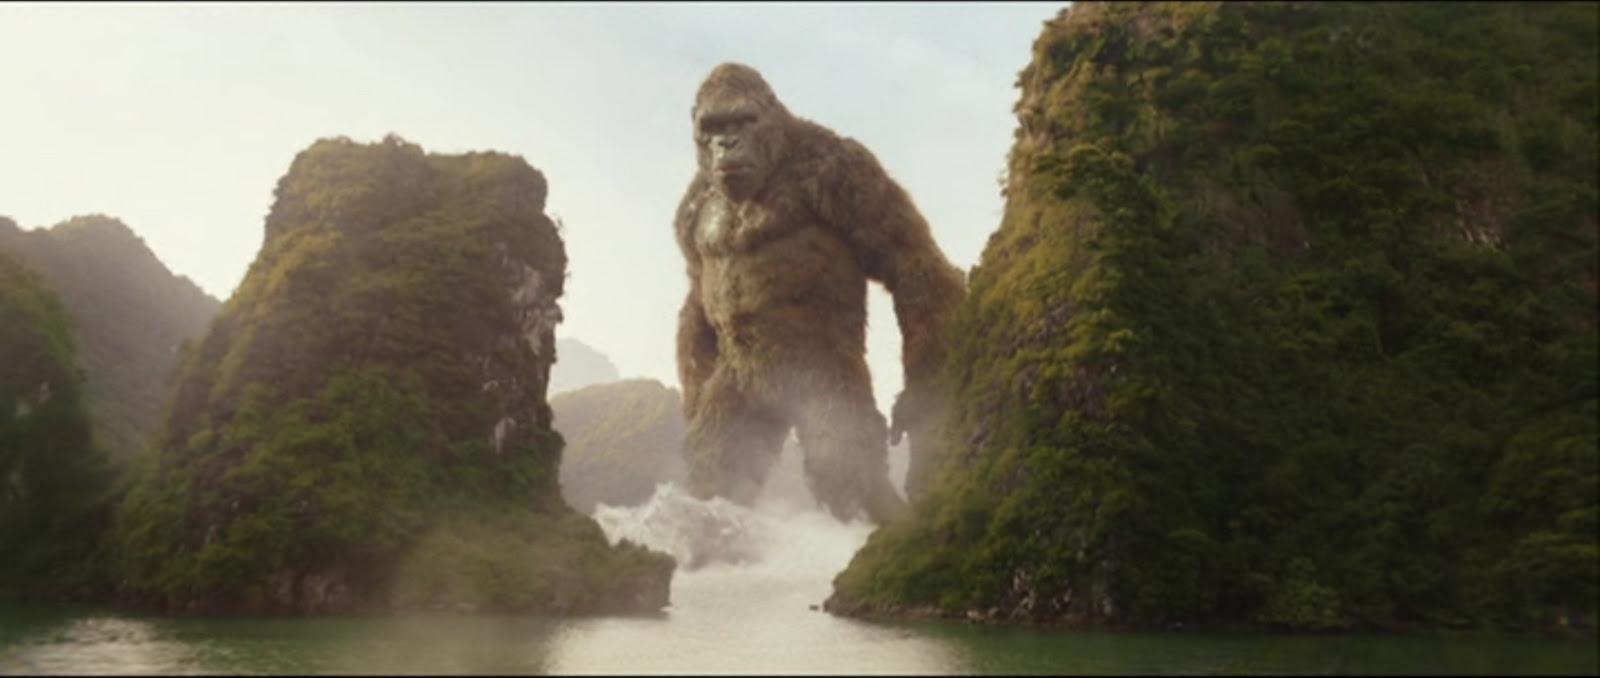 Kong, God-King of Skull Island